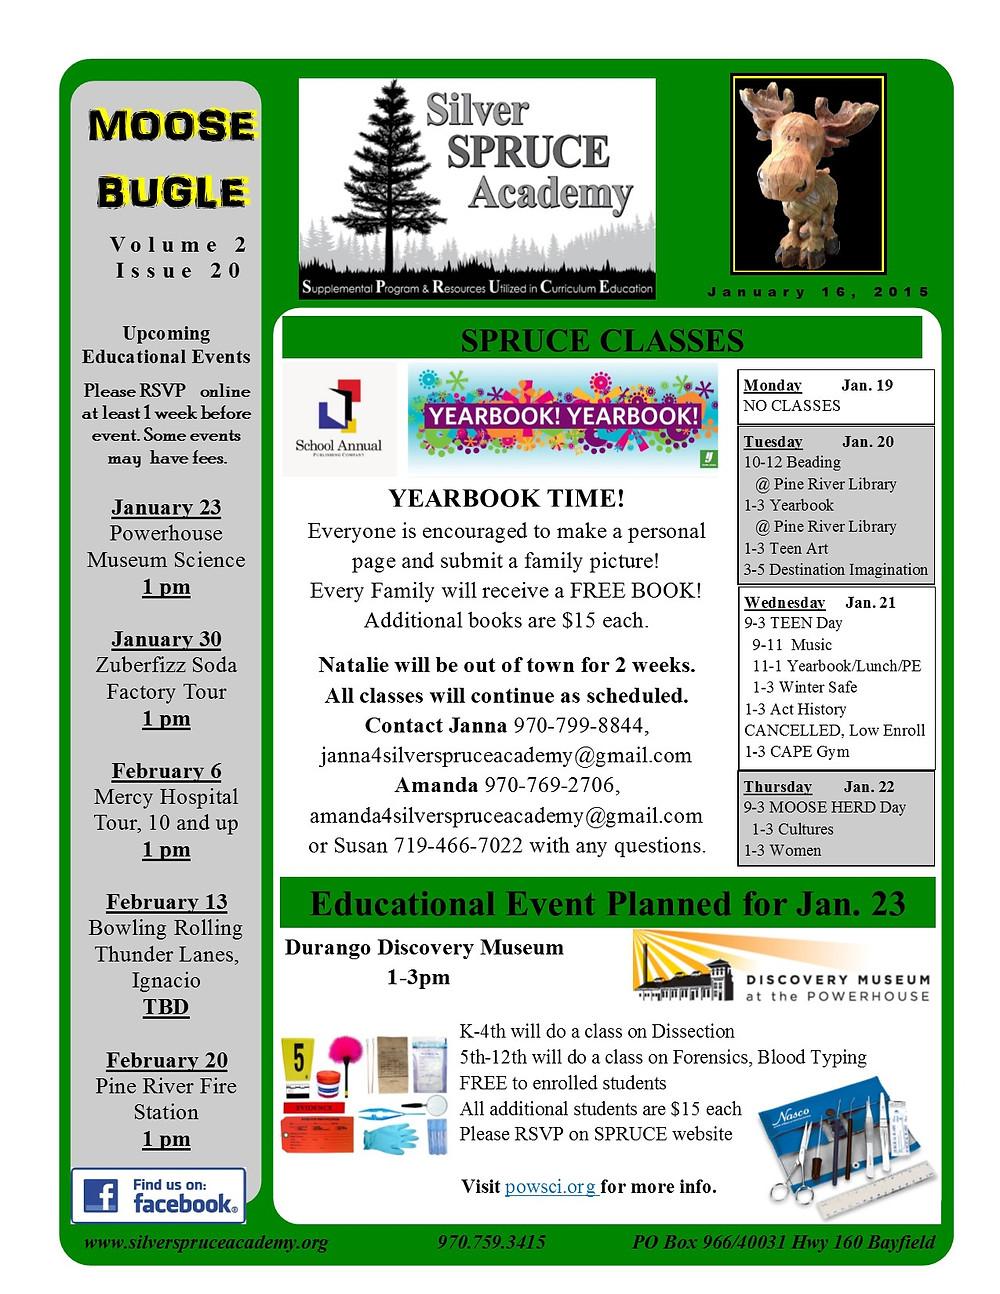 Moose Bugle 1-16-15 (Page 1).jpg